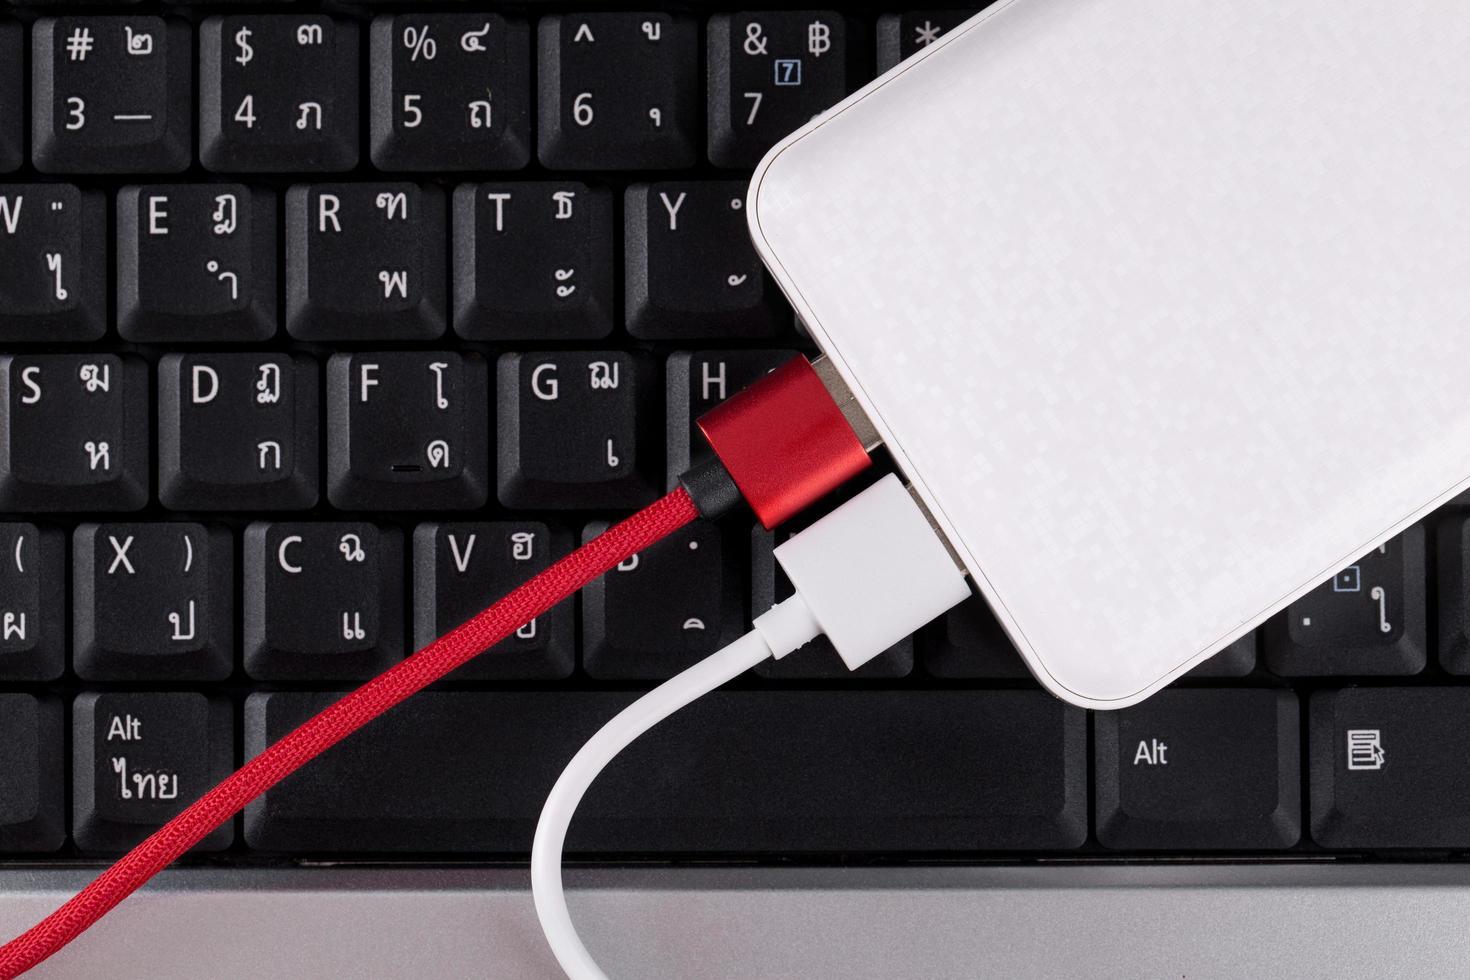 Power bank on a keyboard photo